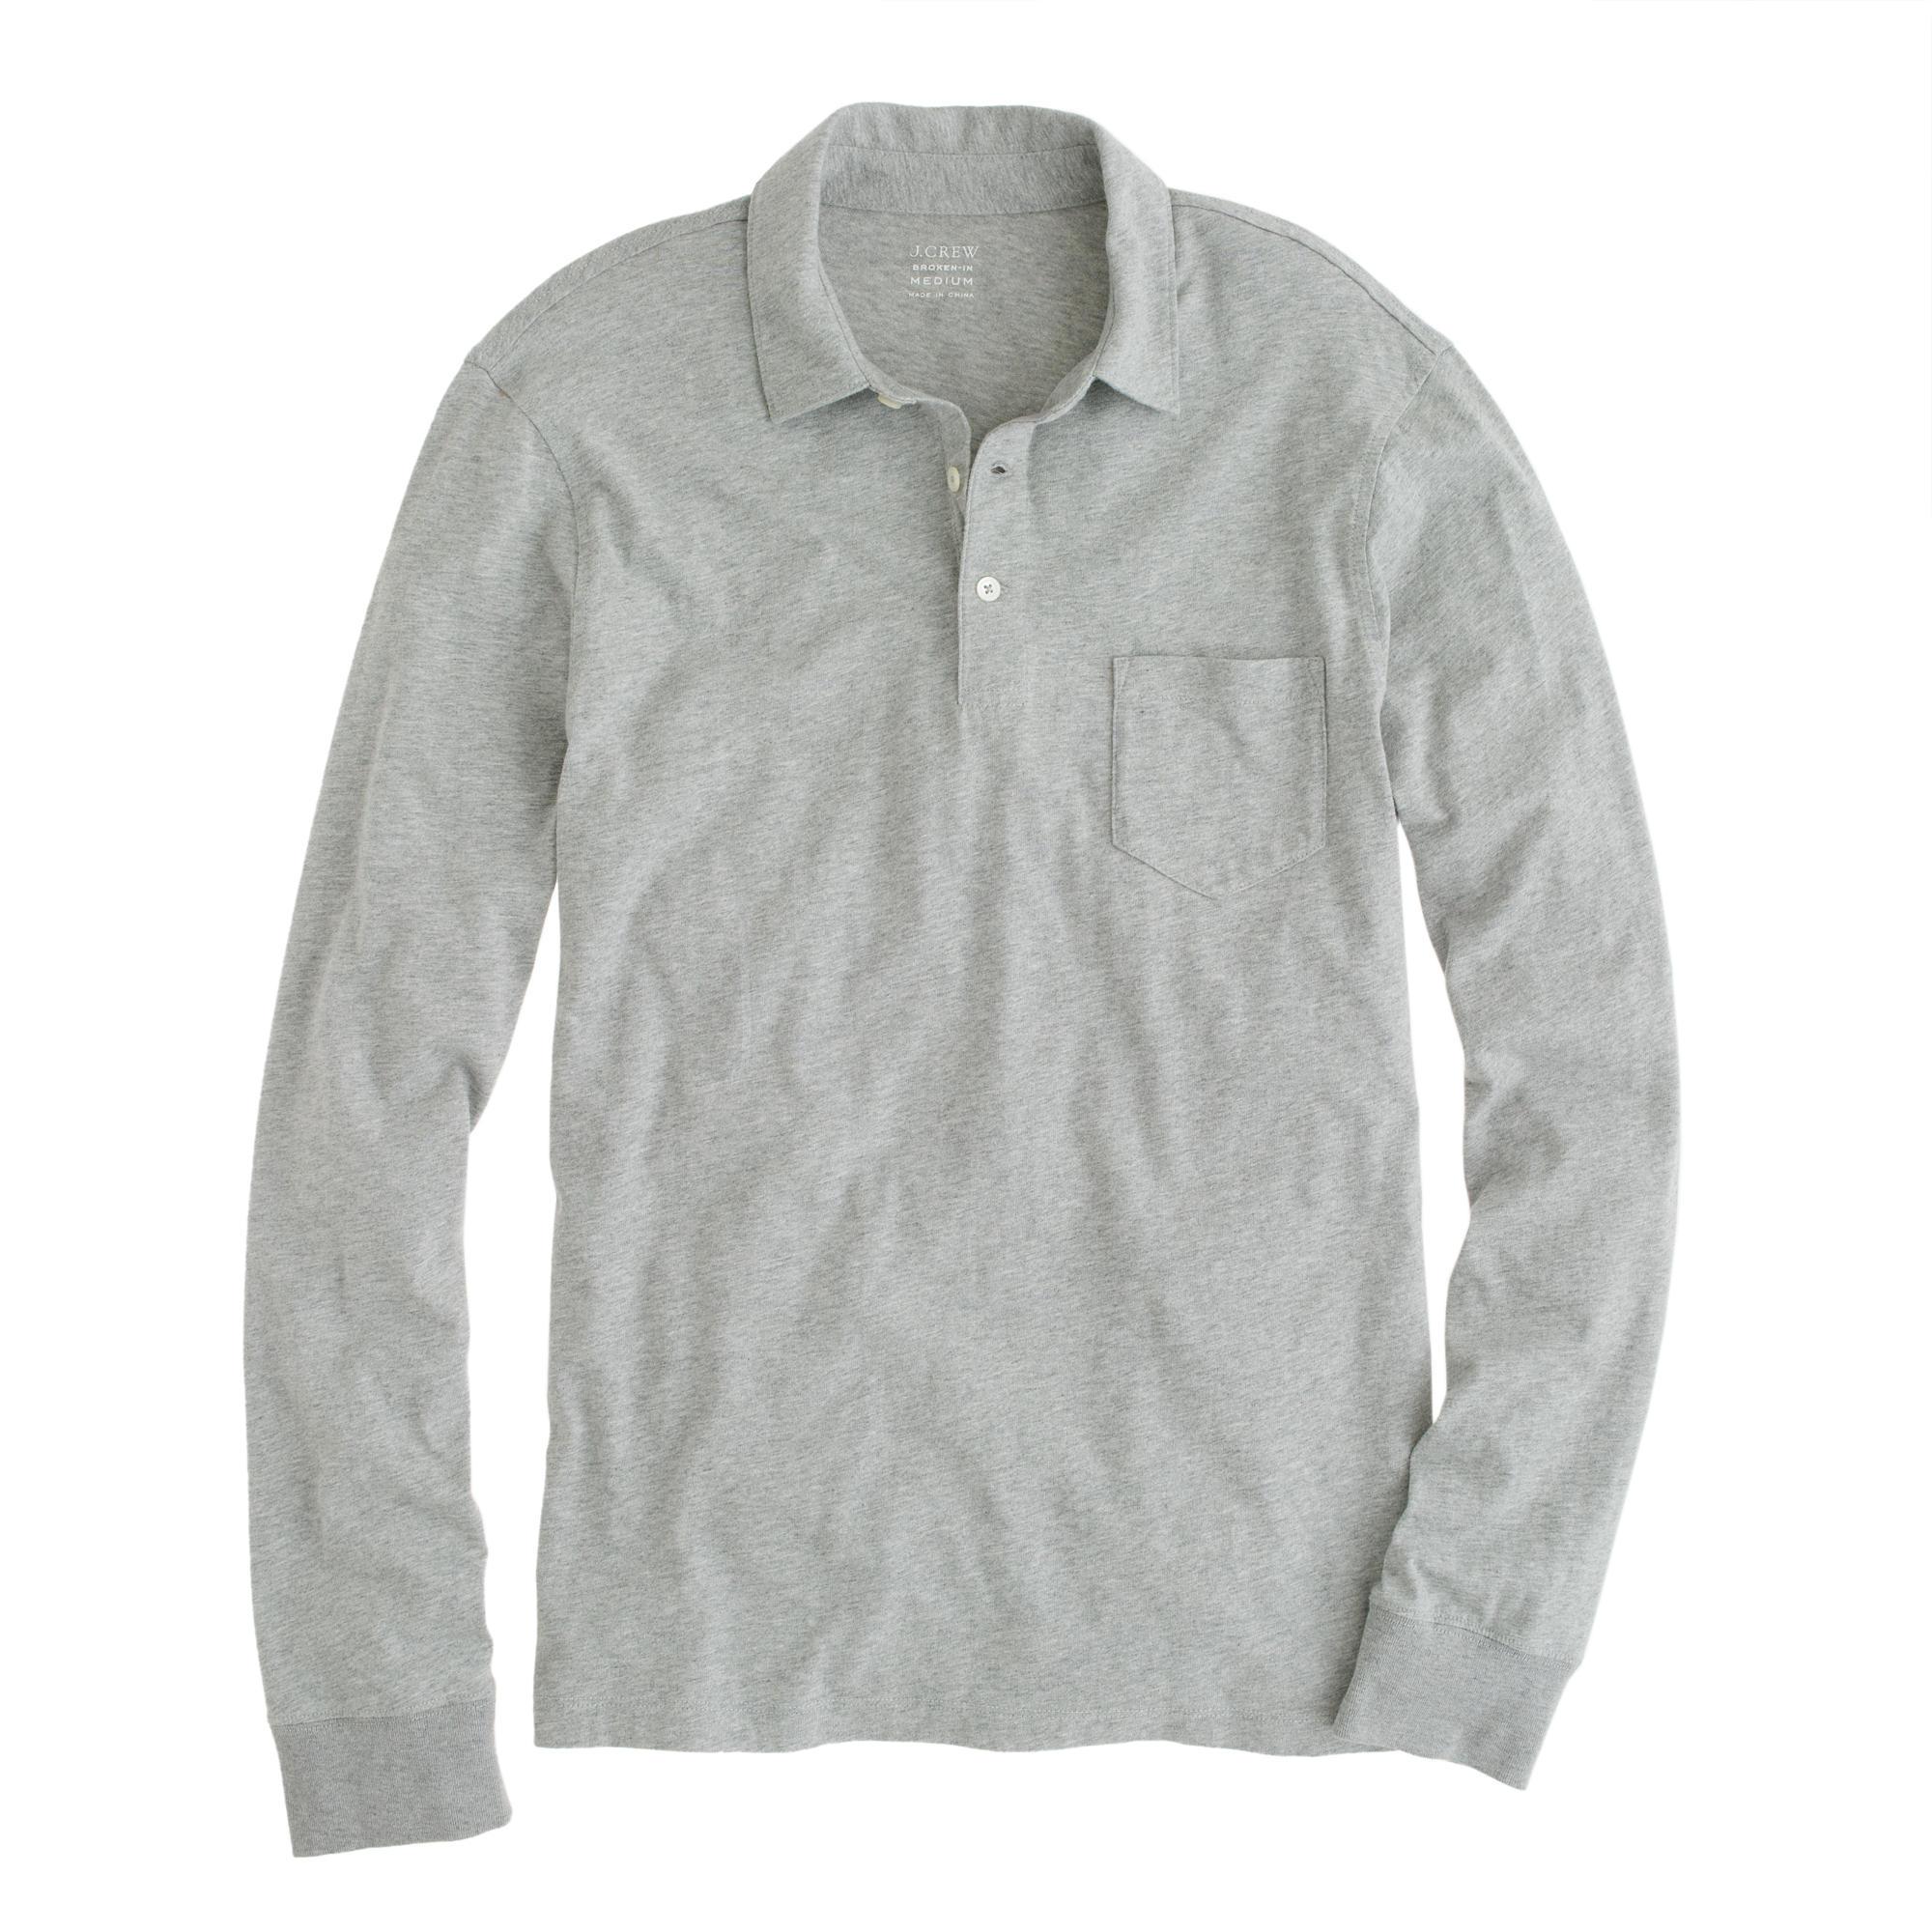 f8b81dfd7f61 Lyst - J.Crew Tall Broken-in Long-sleeve Pocket Polo Shirt in Gray ...